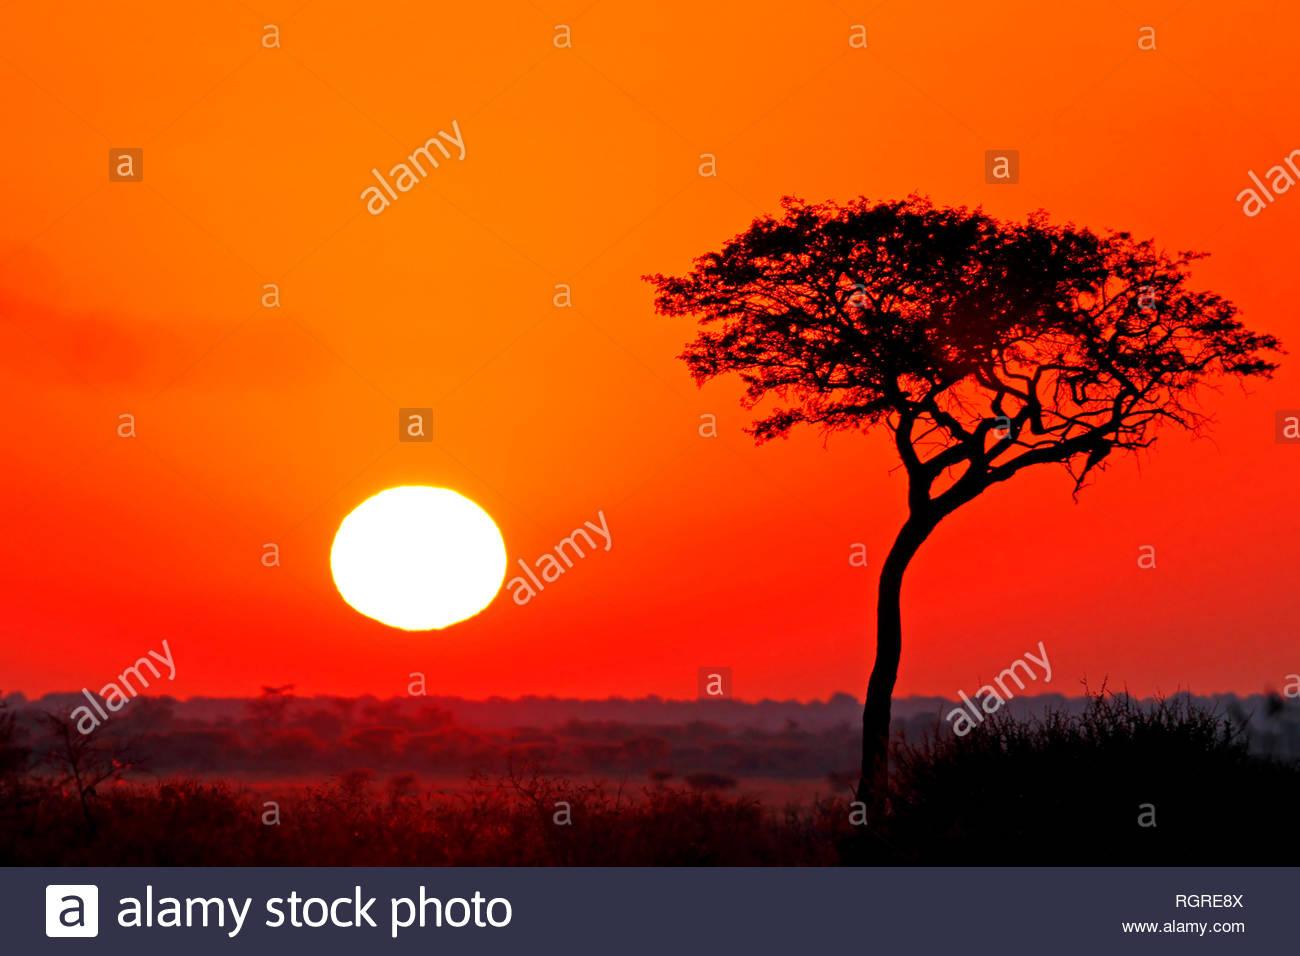 sunrise, central kalahari game reserve, Sunday Pan, Botsuana - Stock Image